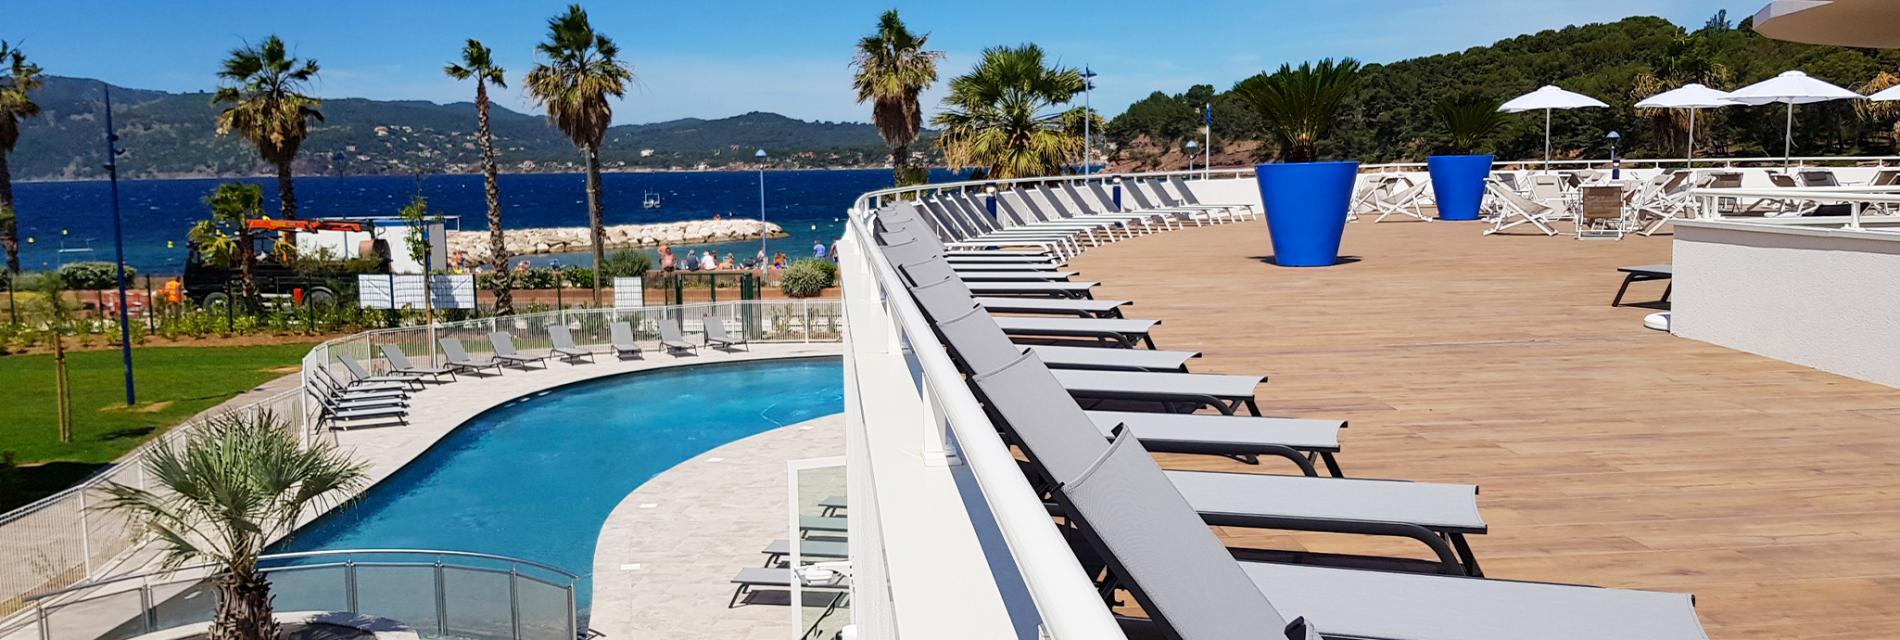 Slide Résidence jardin   - Cap Azur